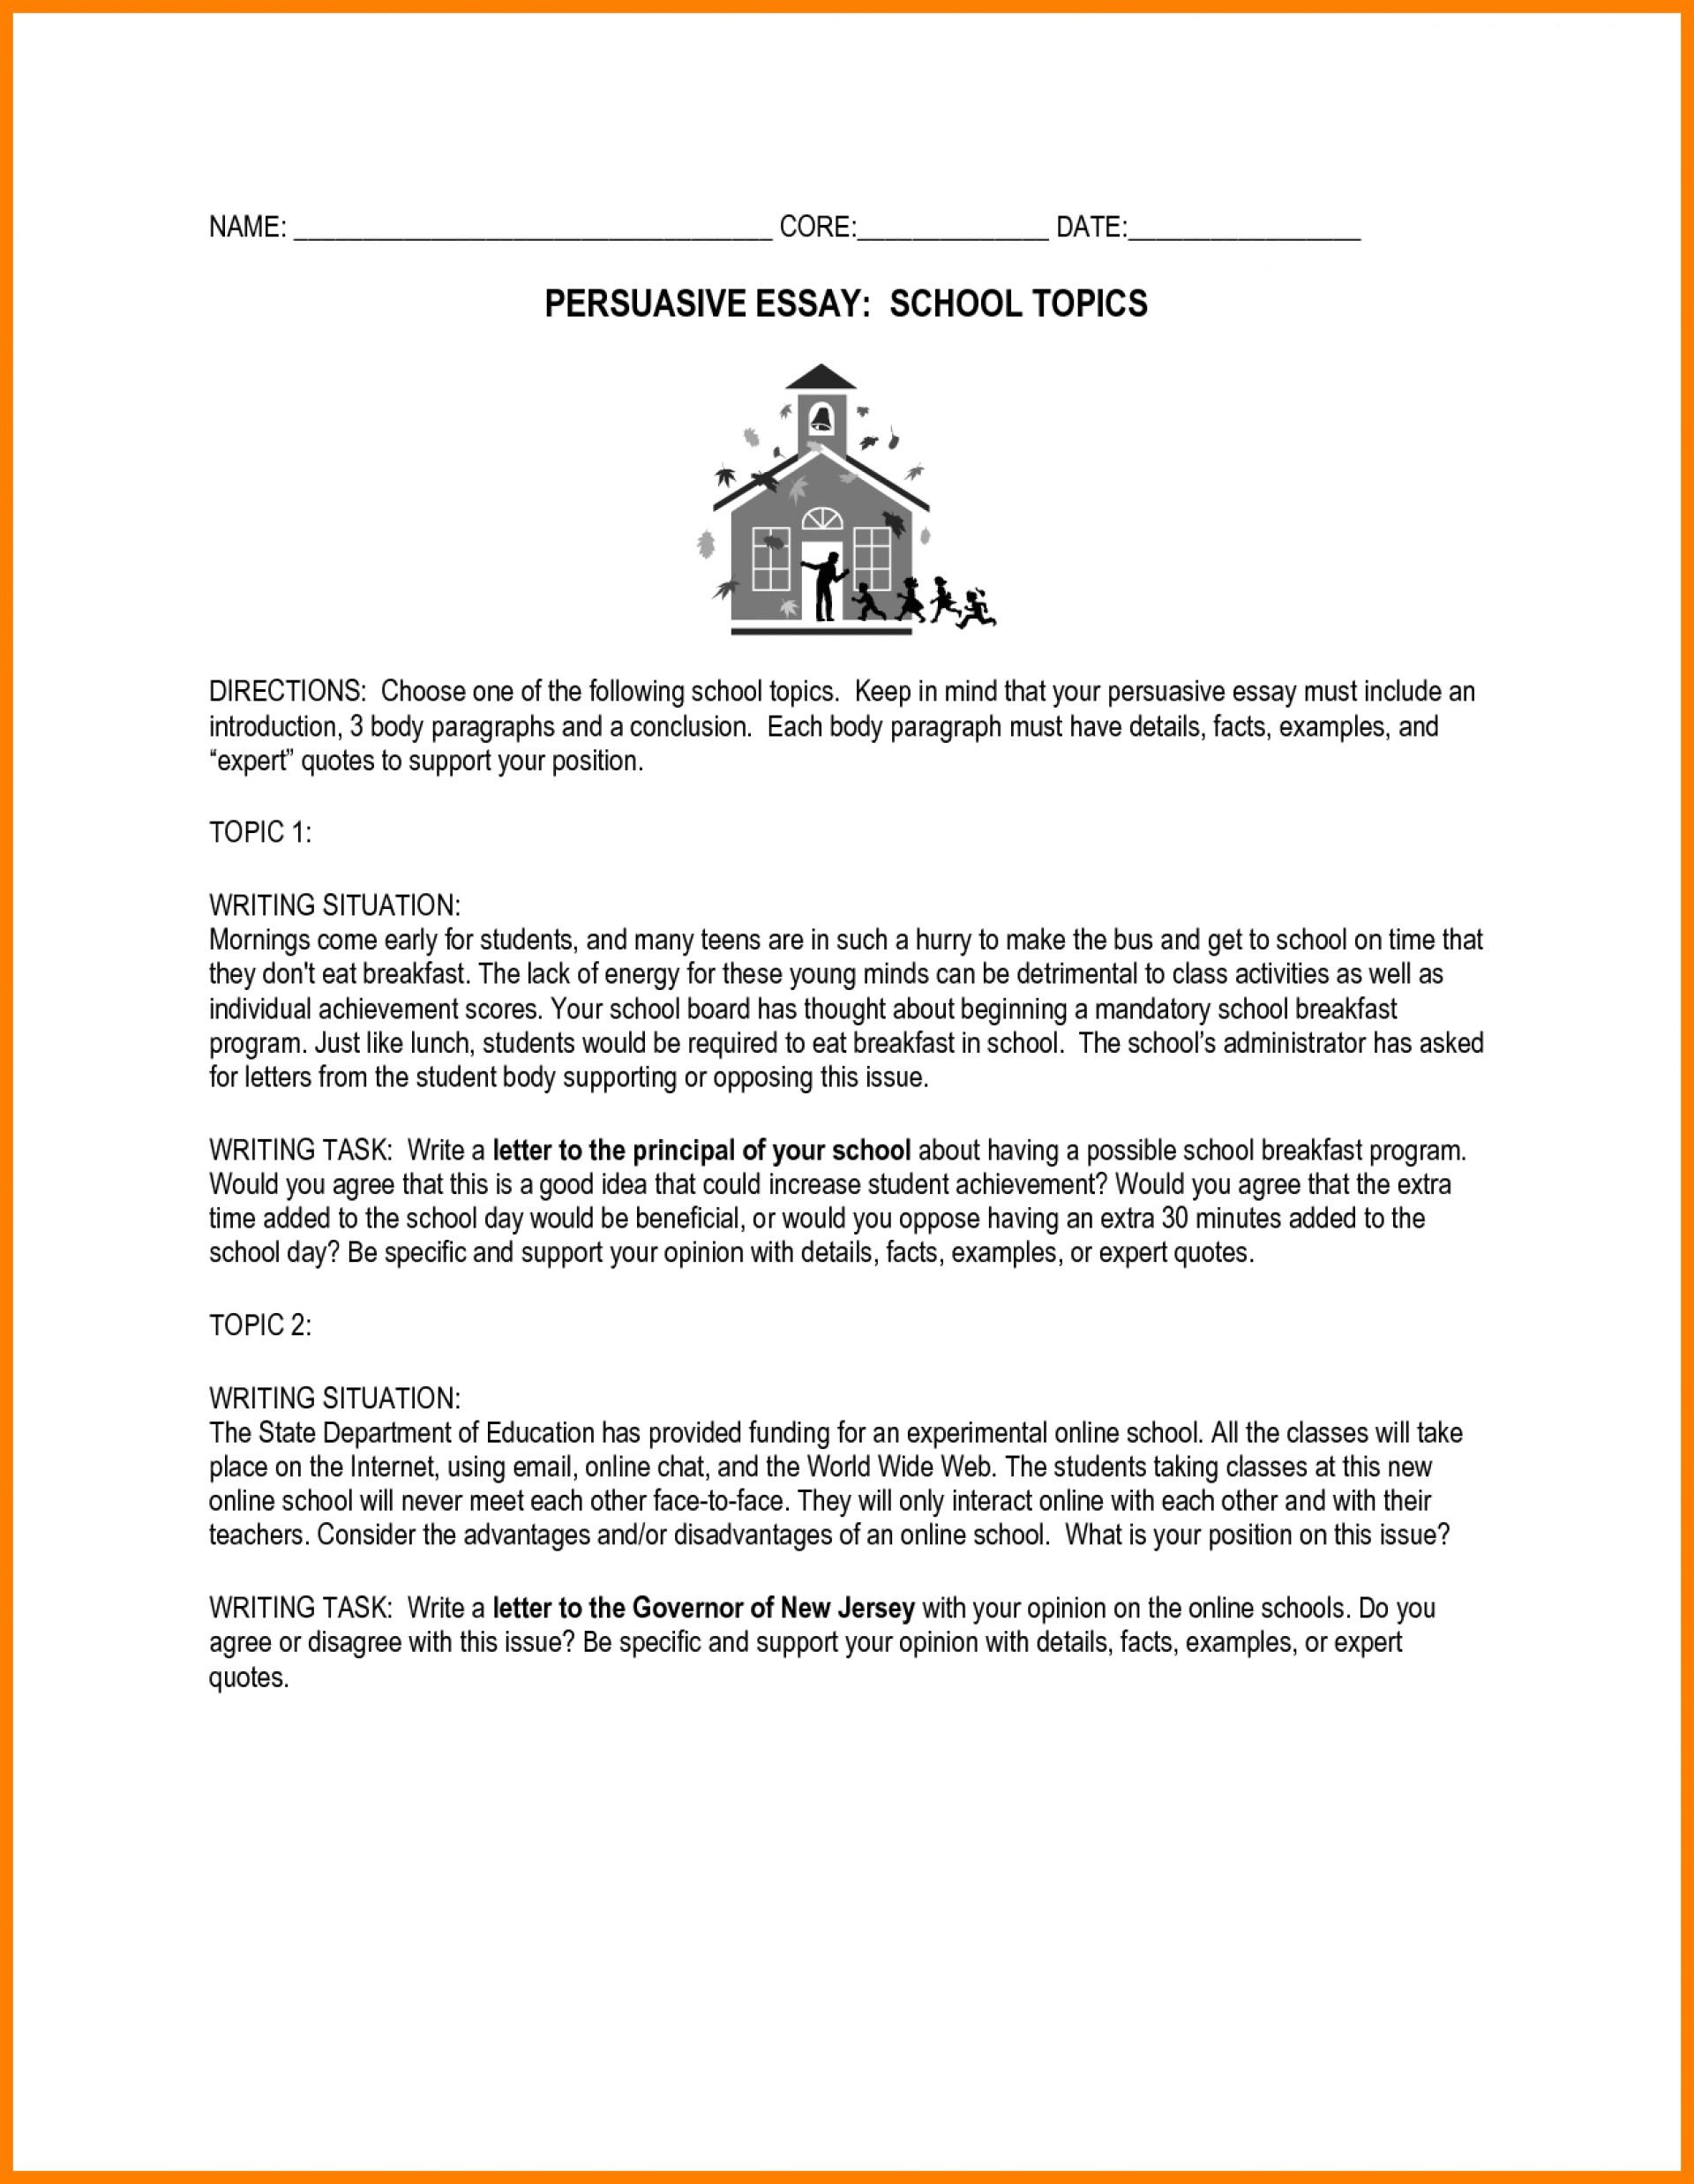 example of persuasive essay middle school   essay writing top  persuasive essay topics for middle school example thatsnotus